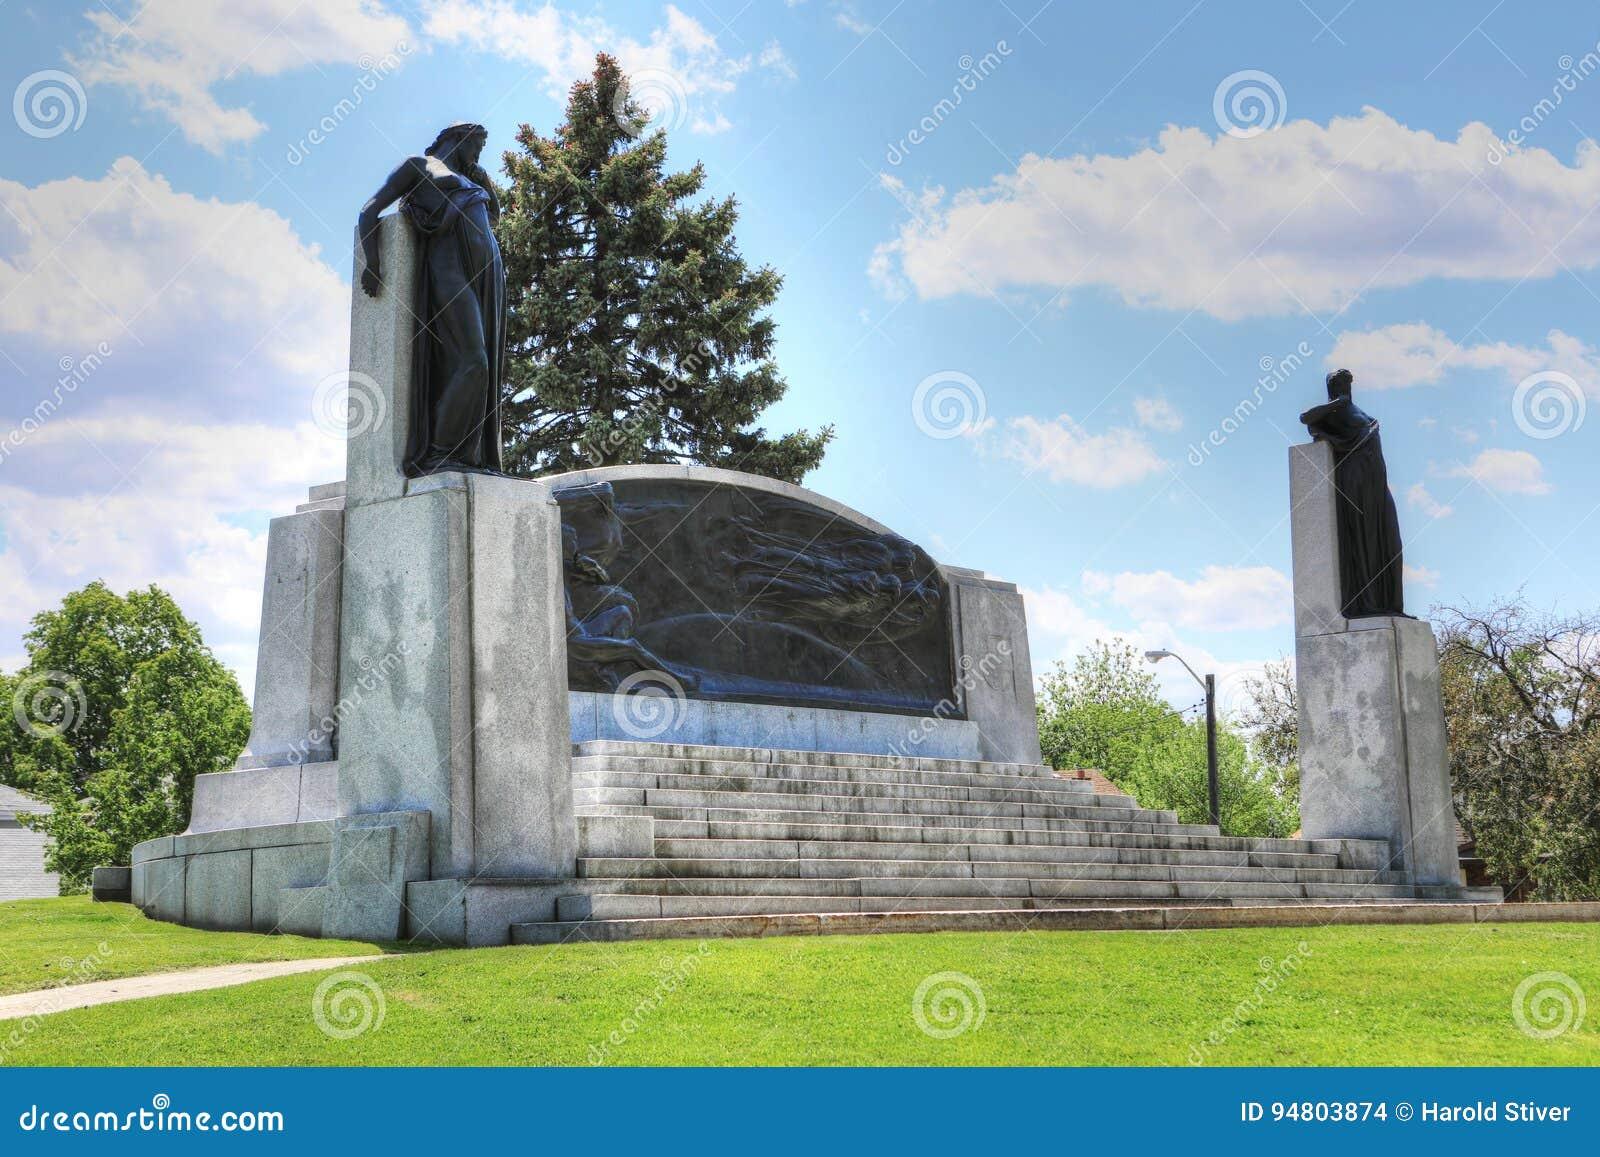 Pomnik w Brantford, Ontario, Kanada dla Alexander Graham Bell